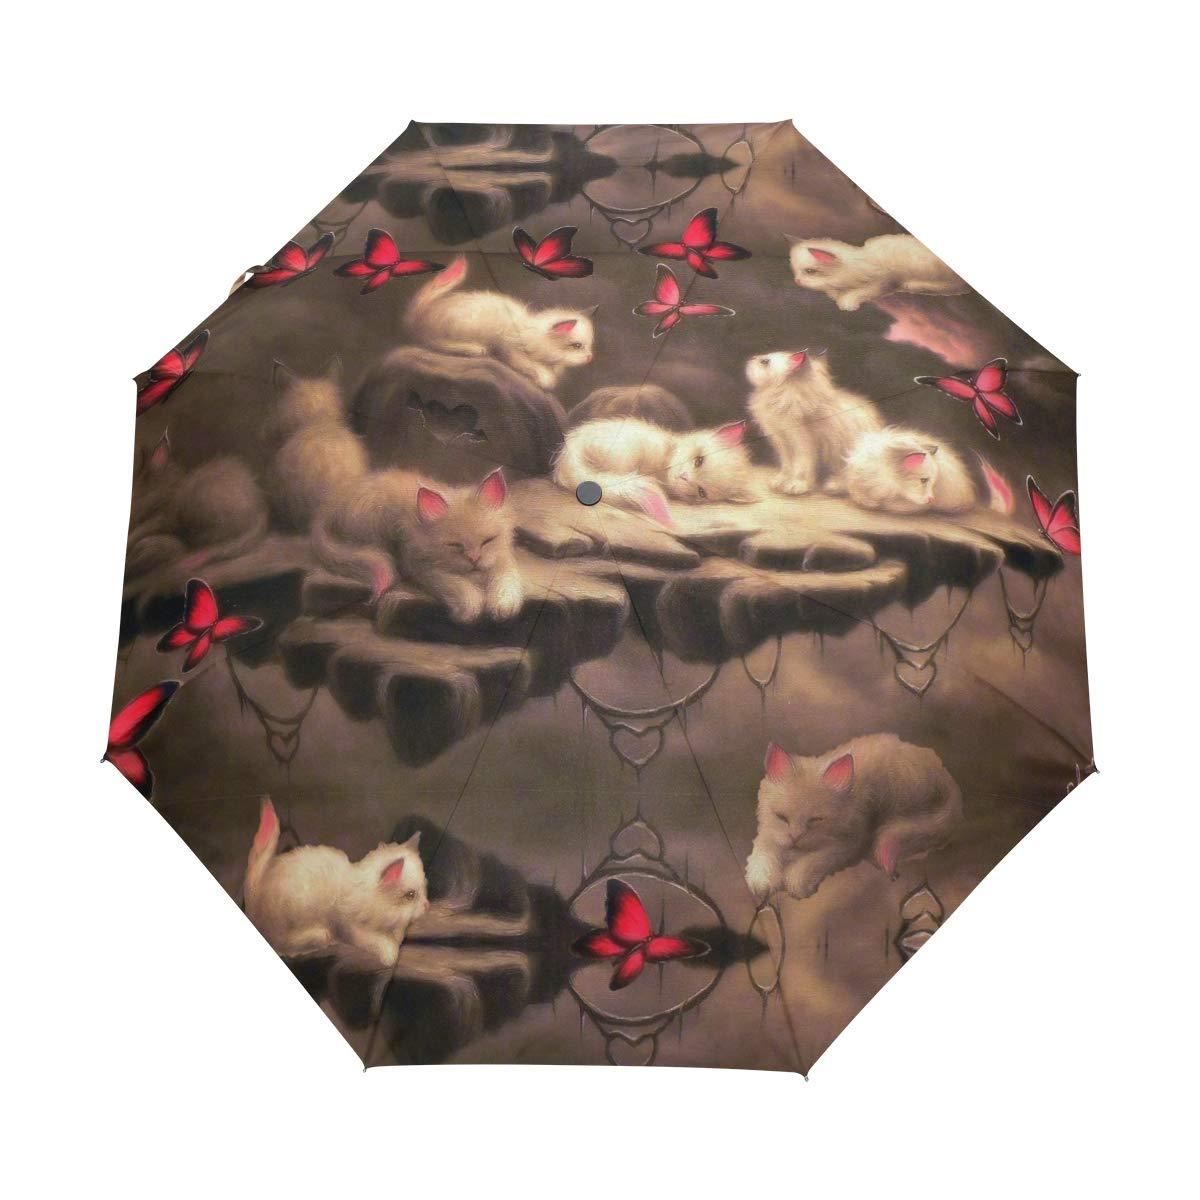 4de2562d98c0 Amazon.com: FVFV Cat Automatic Foldable Umbrella UV Protection Auto ...